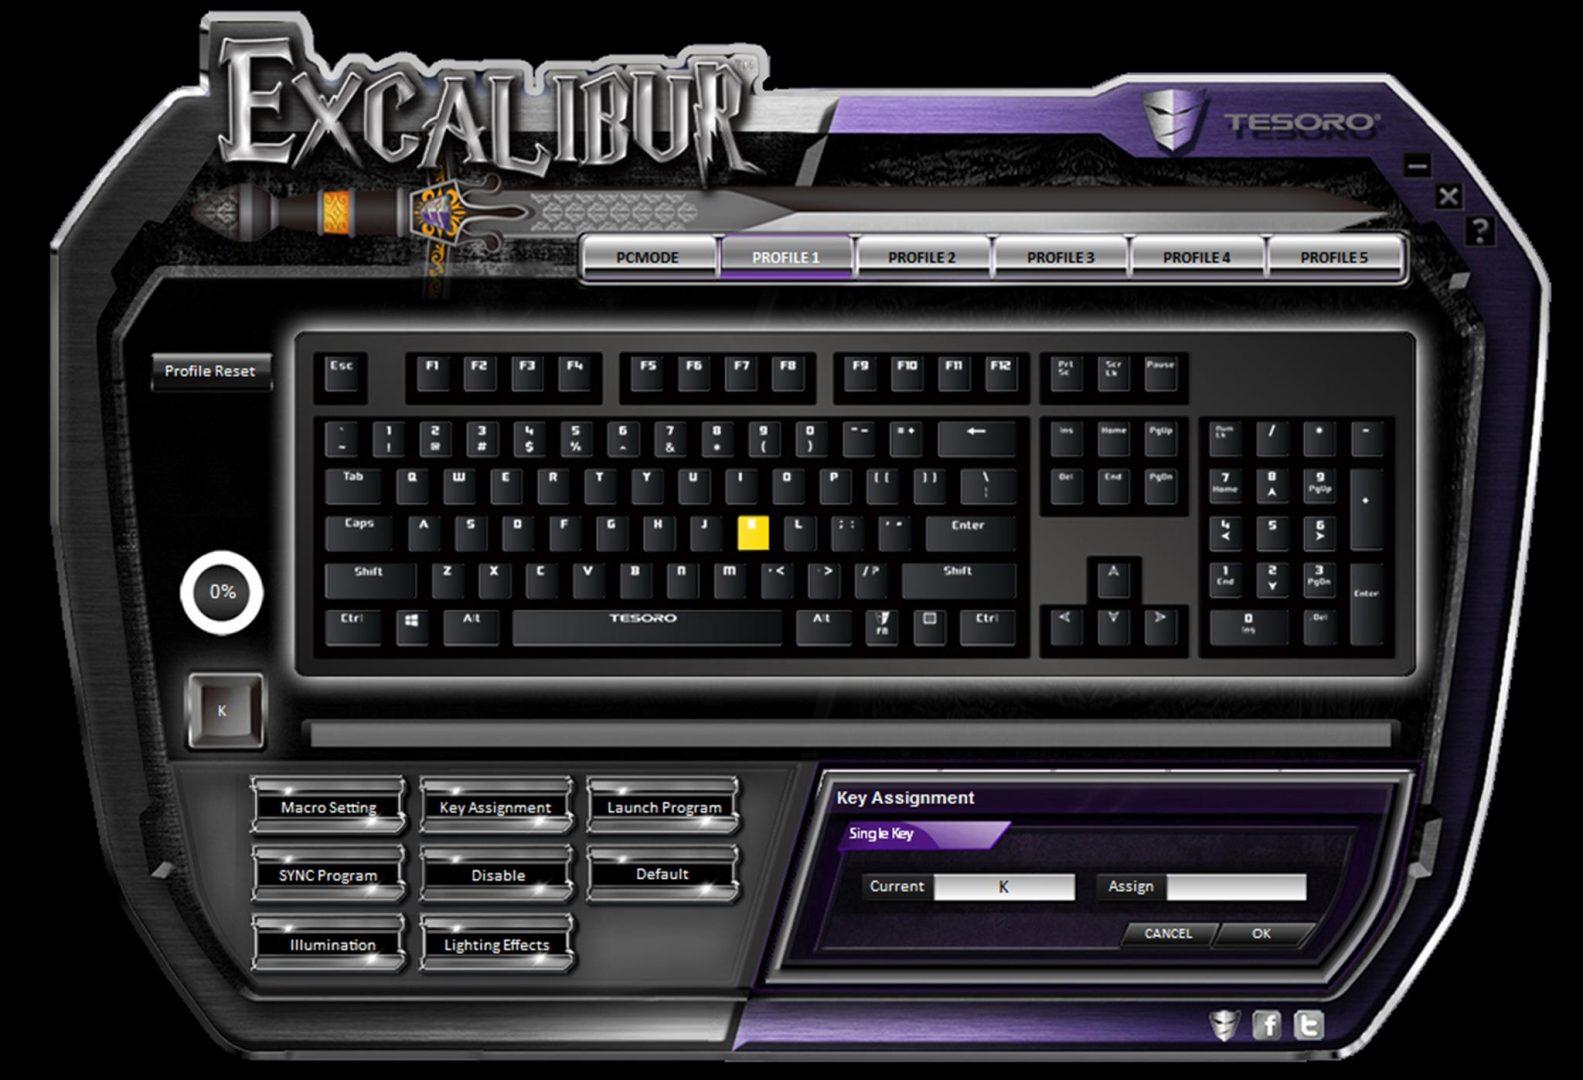 tesoro excalibur spectrum software 2